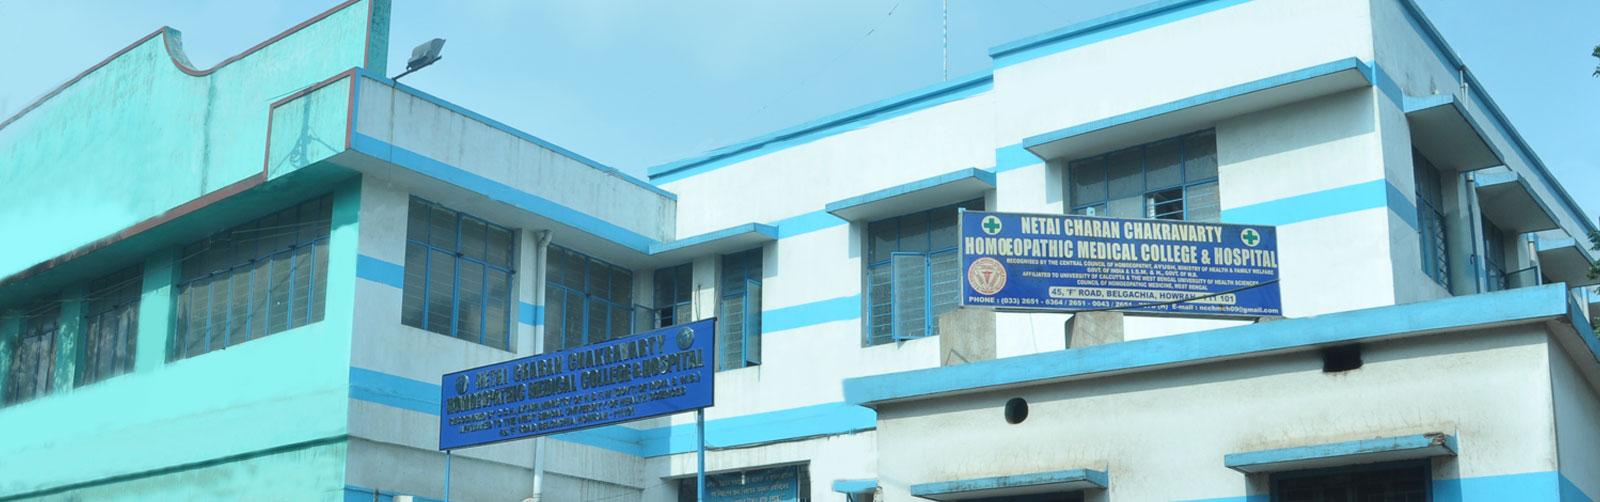 Netai Charan Chakravarty Homoeopathic Medical College and  Hospital, Howrah Image